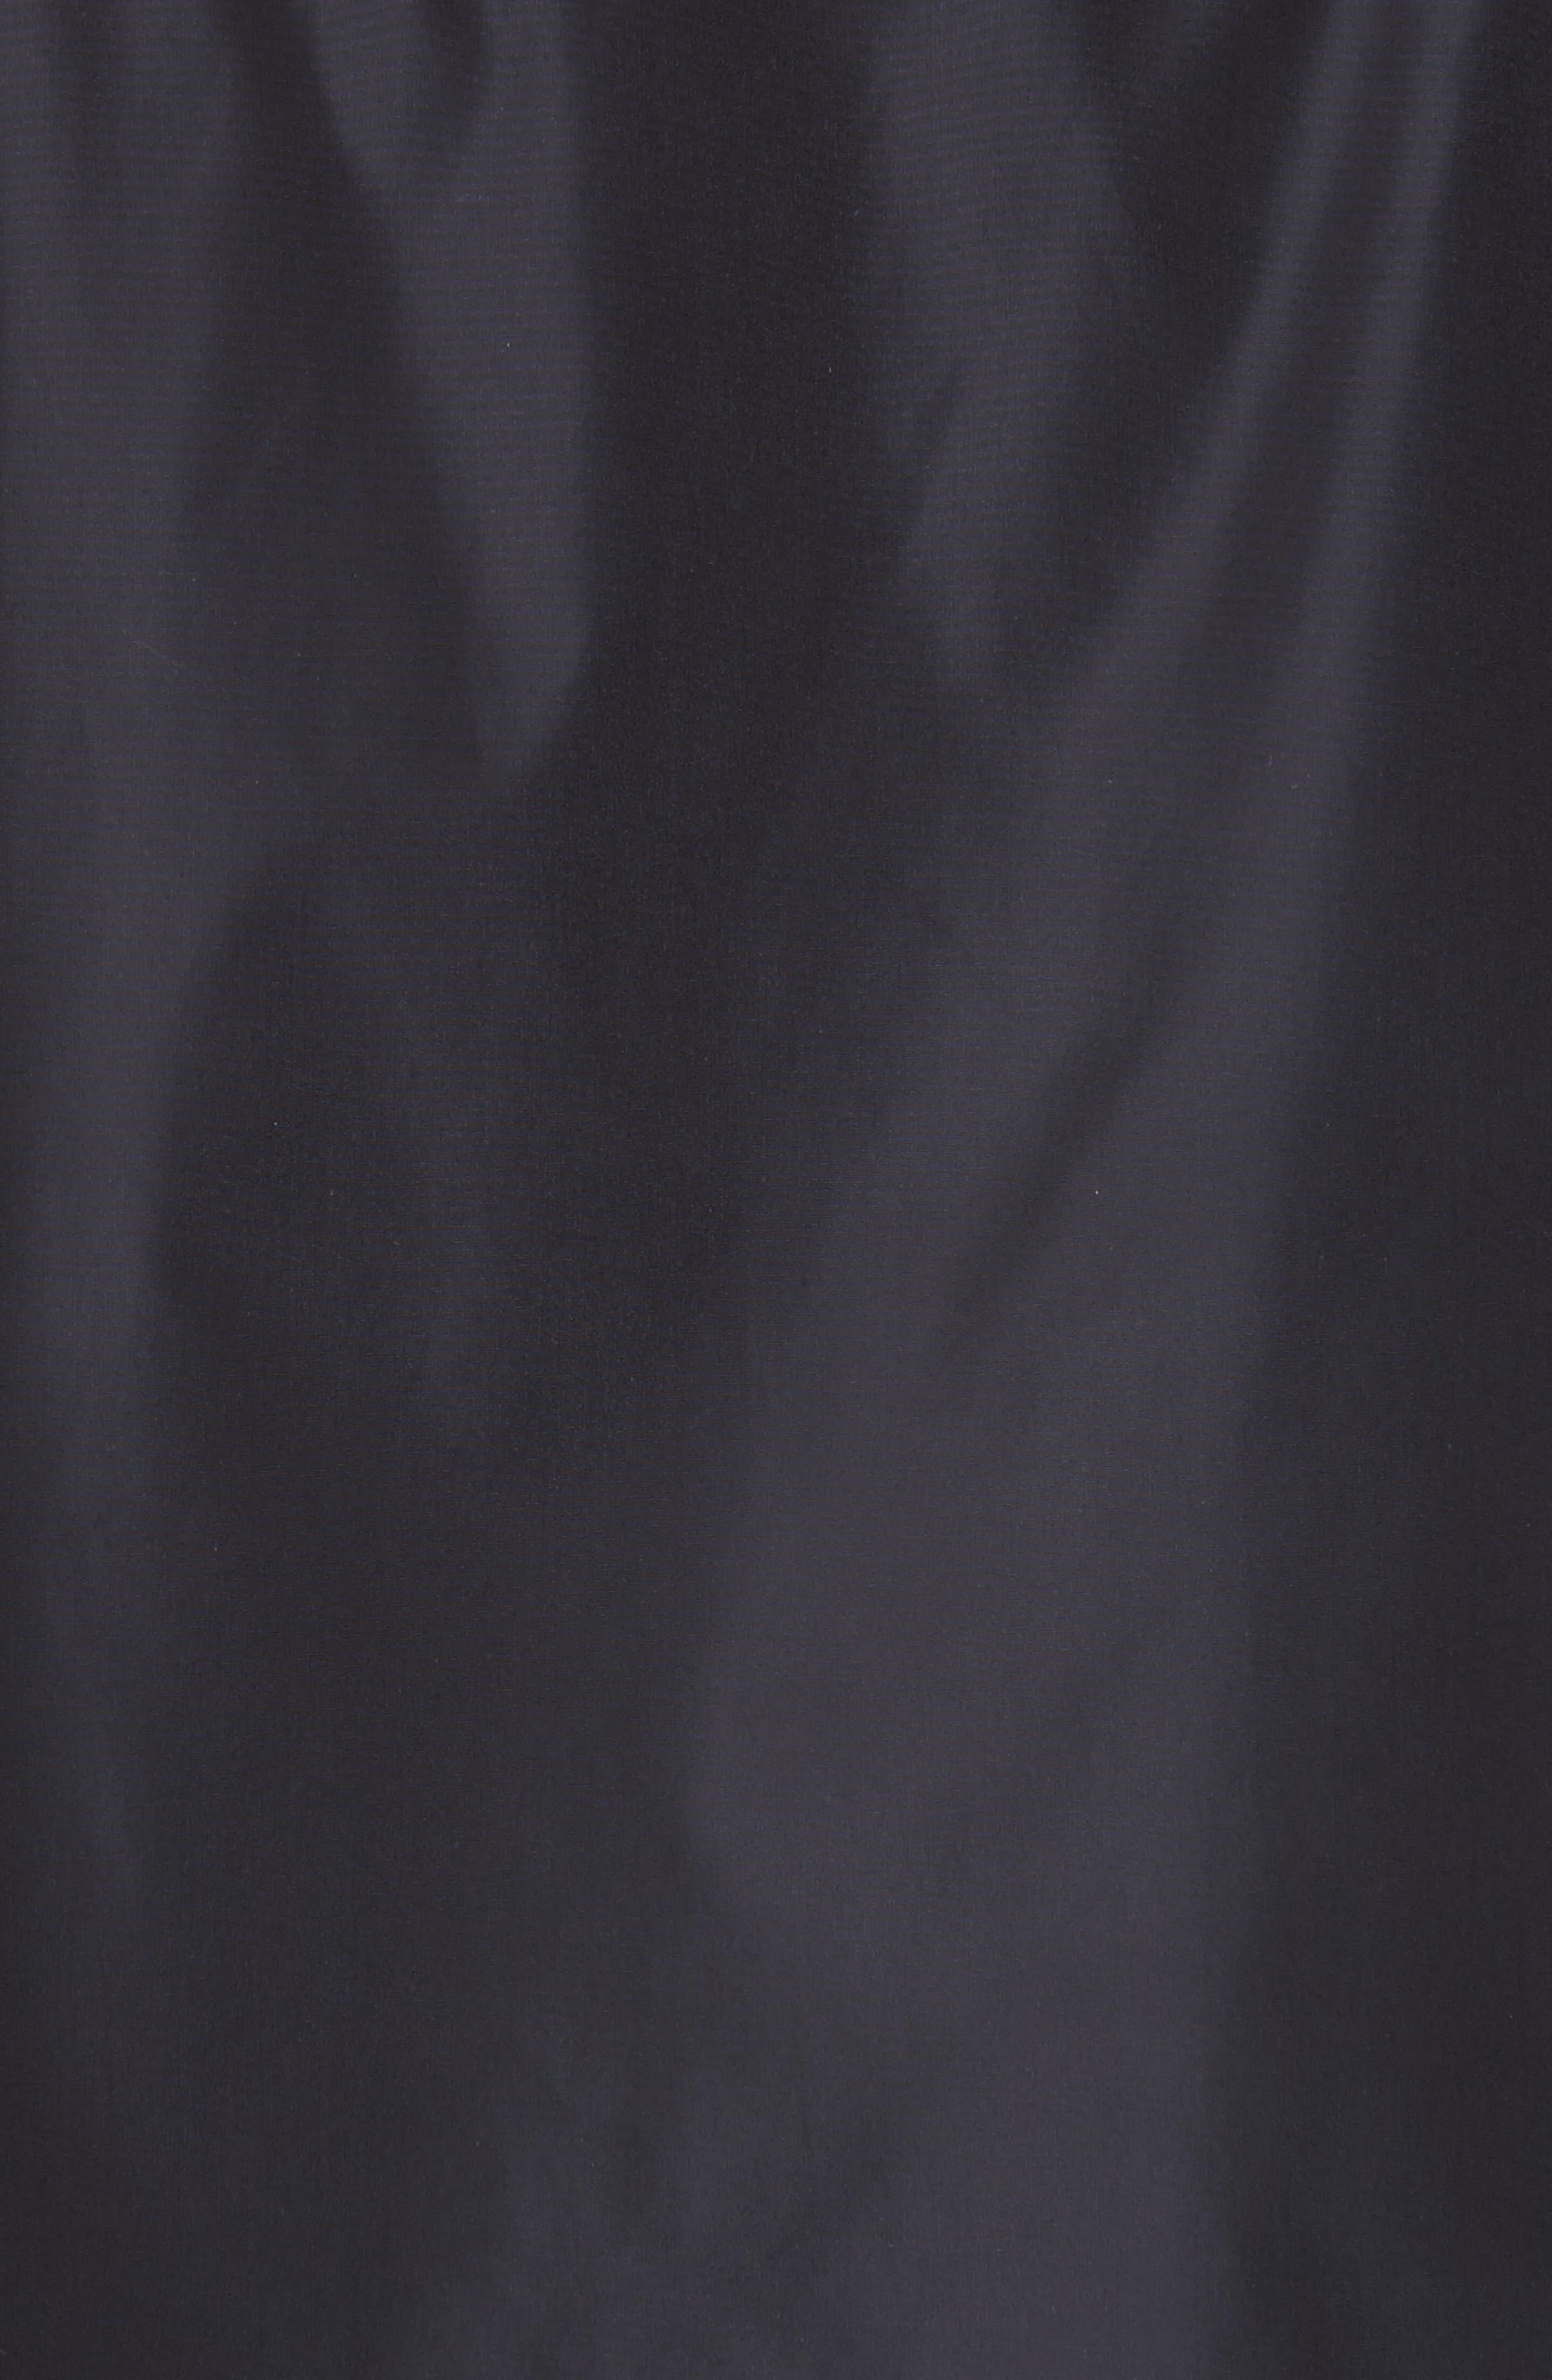 Goulier Nylon Jacket,                             Alternate thumbnail 6, color,                             NAVY